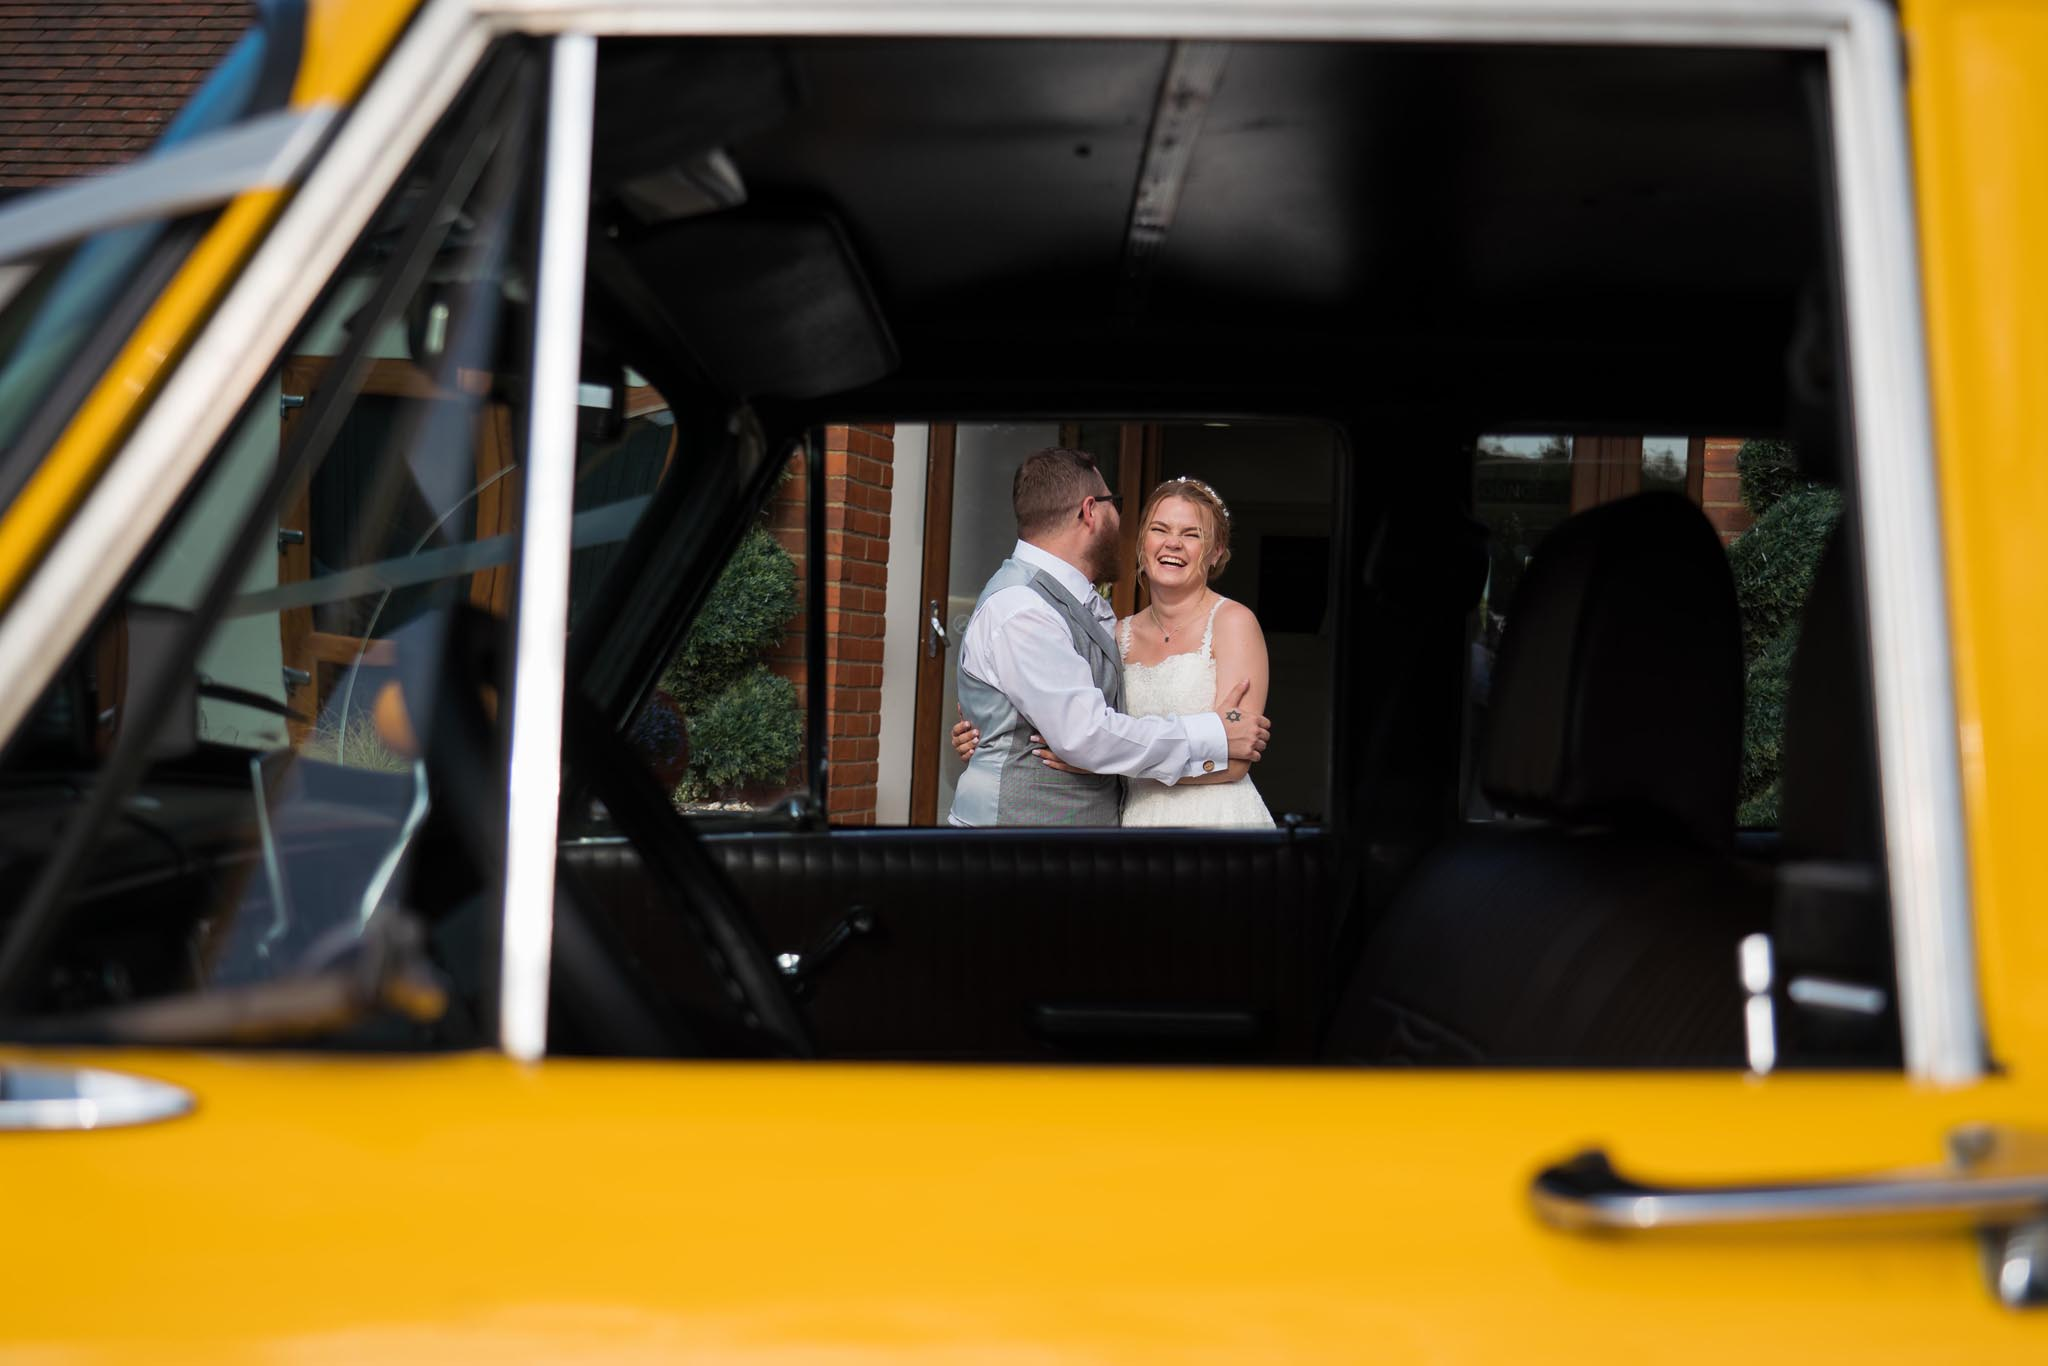 517-Bride-groom-Luke-Yasmin-The-Rayleigh-Club-Wedding-Photography.jpg